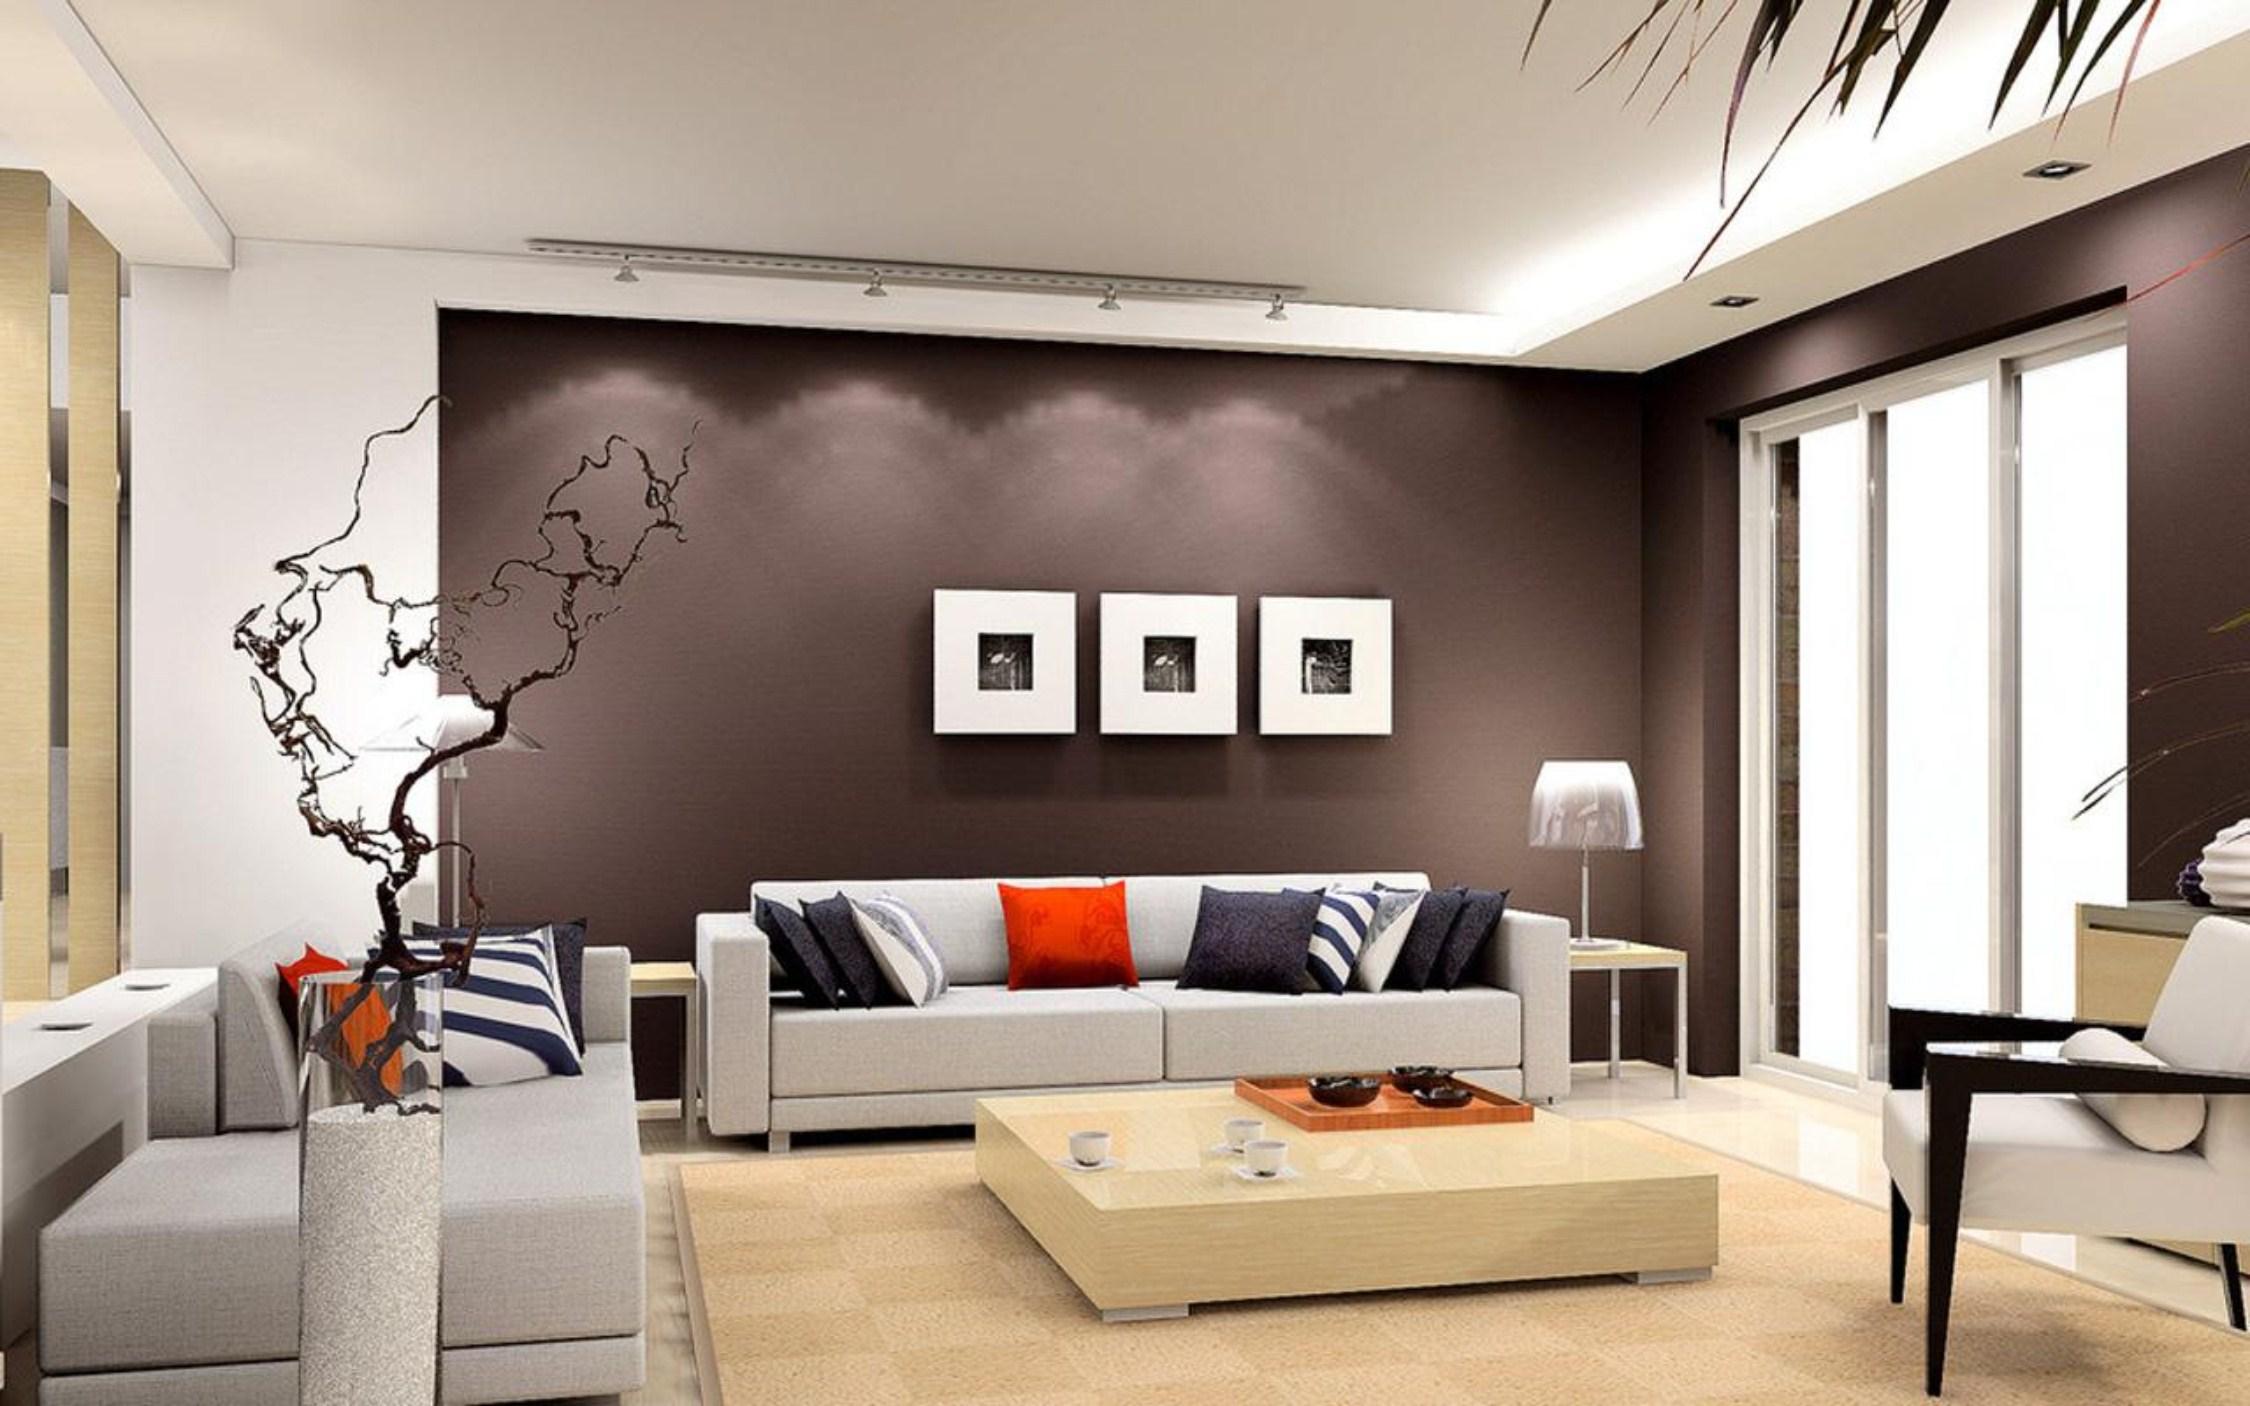 Interior Design and Decoration  amazoncom